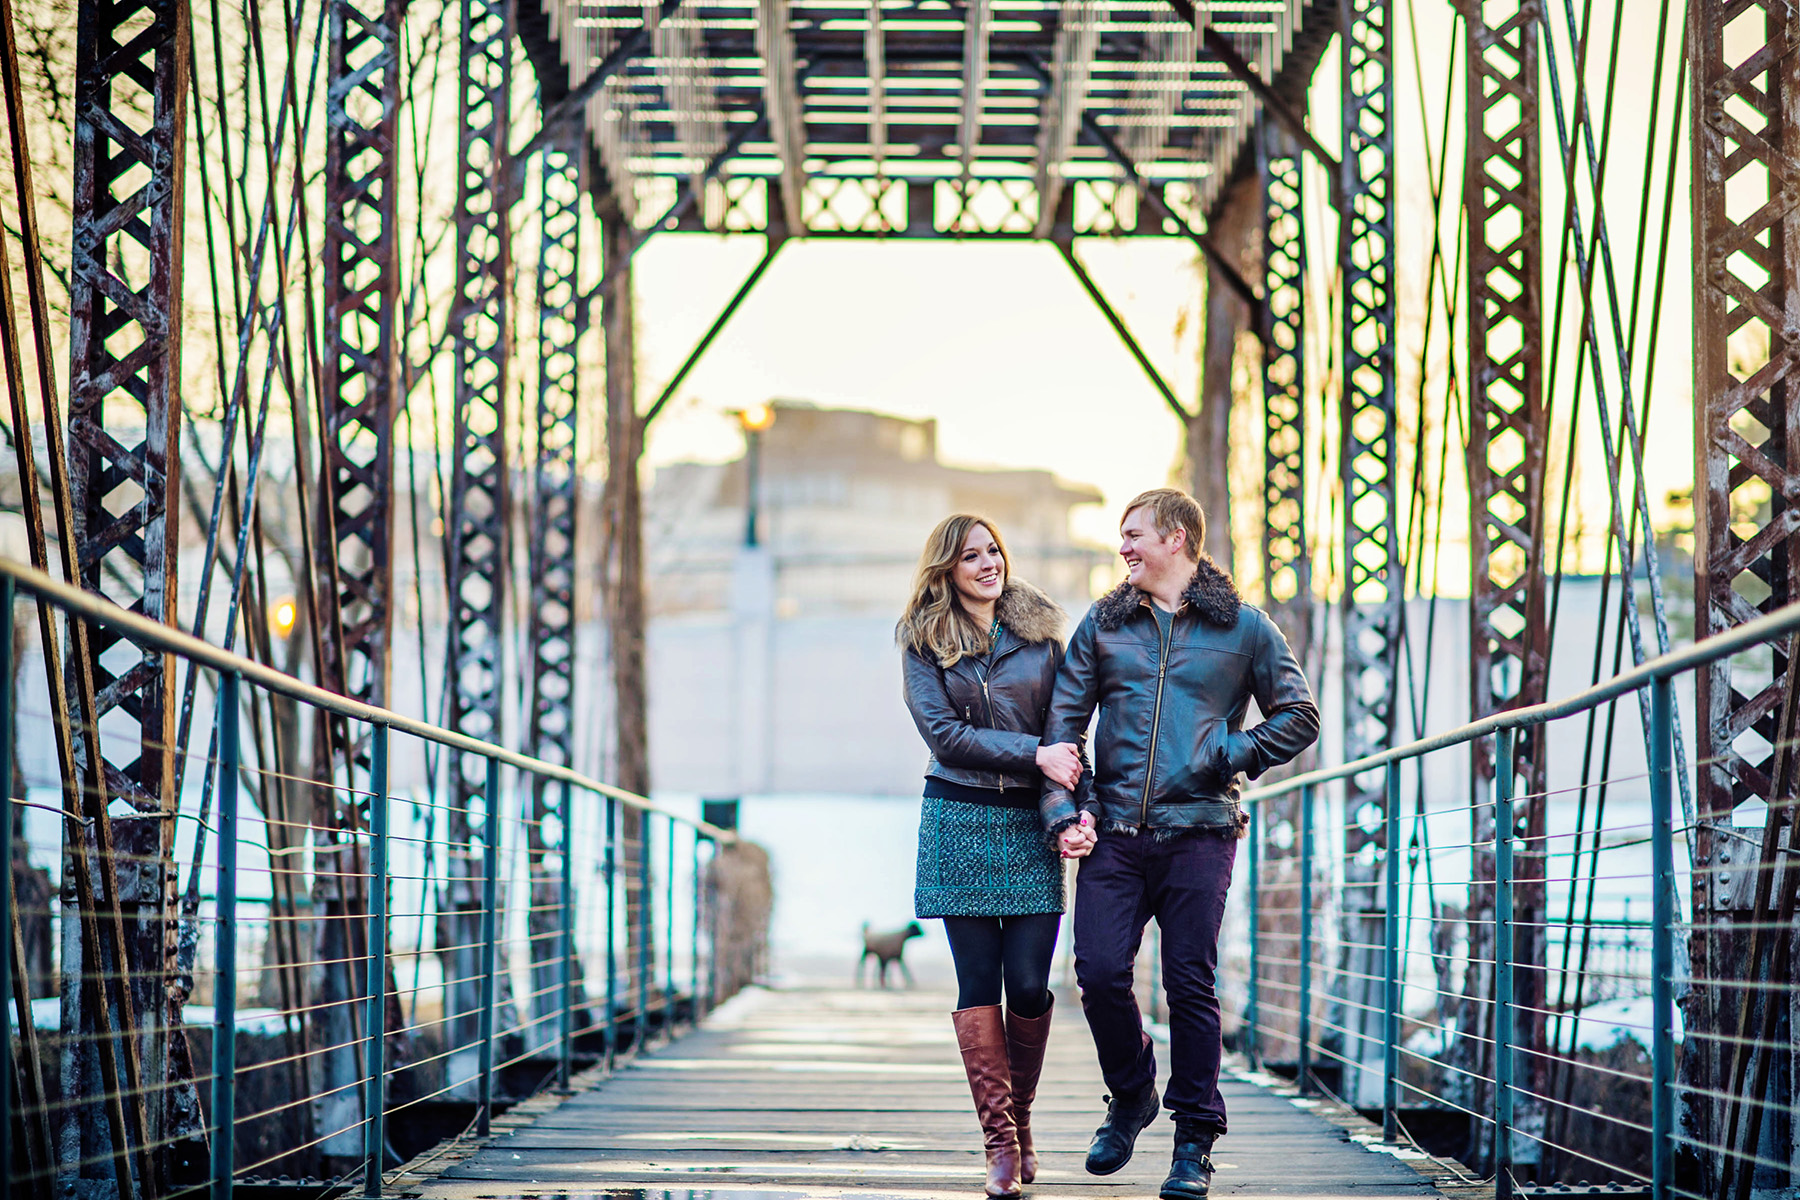 wedding_photographer_urban0017.jpg